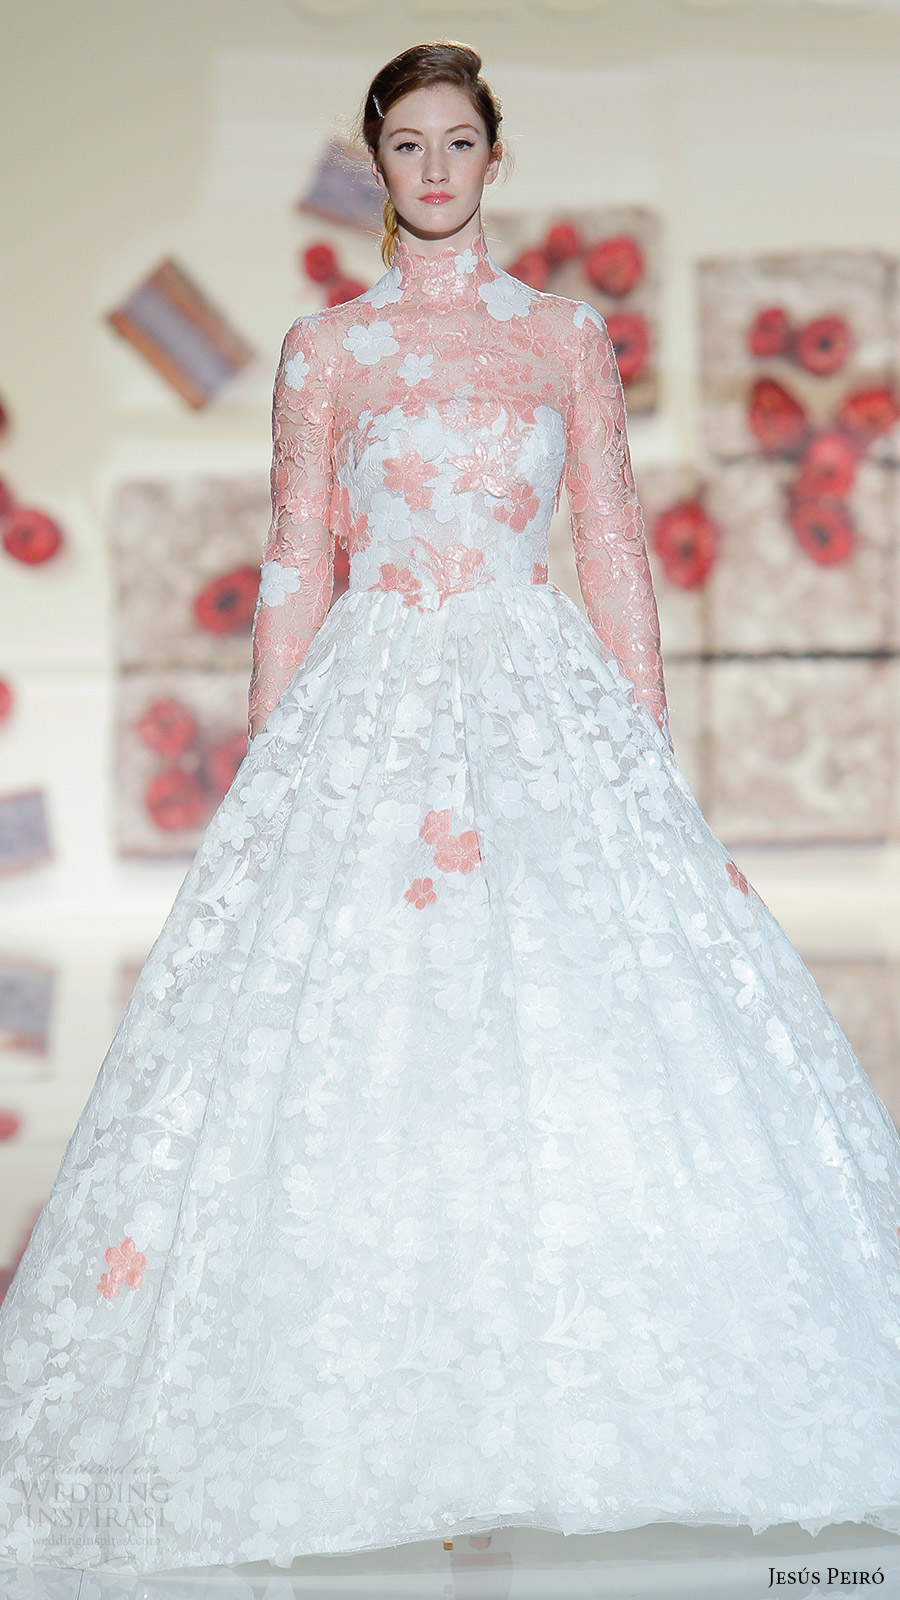 Wedding Dress Color Trends : Jesus peiro bridal long sleeves high neck ball gown weddng dress